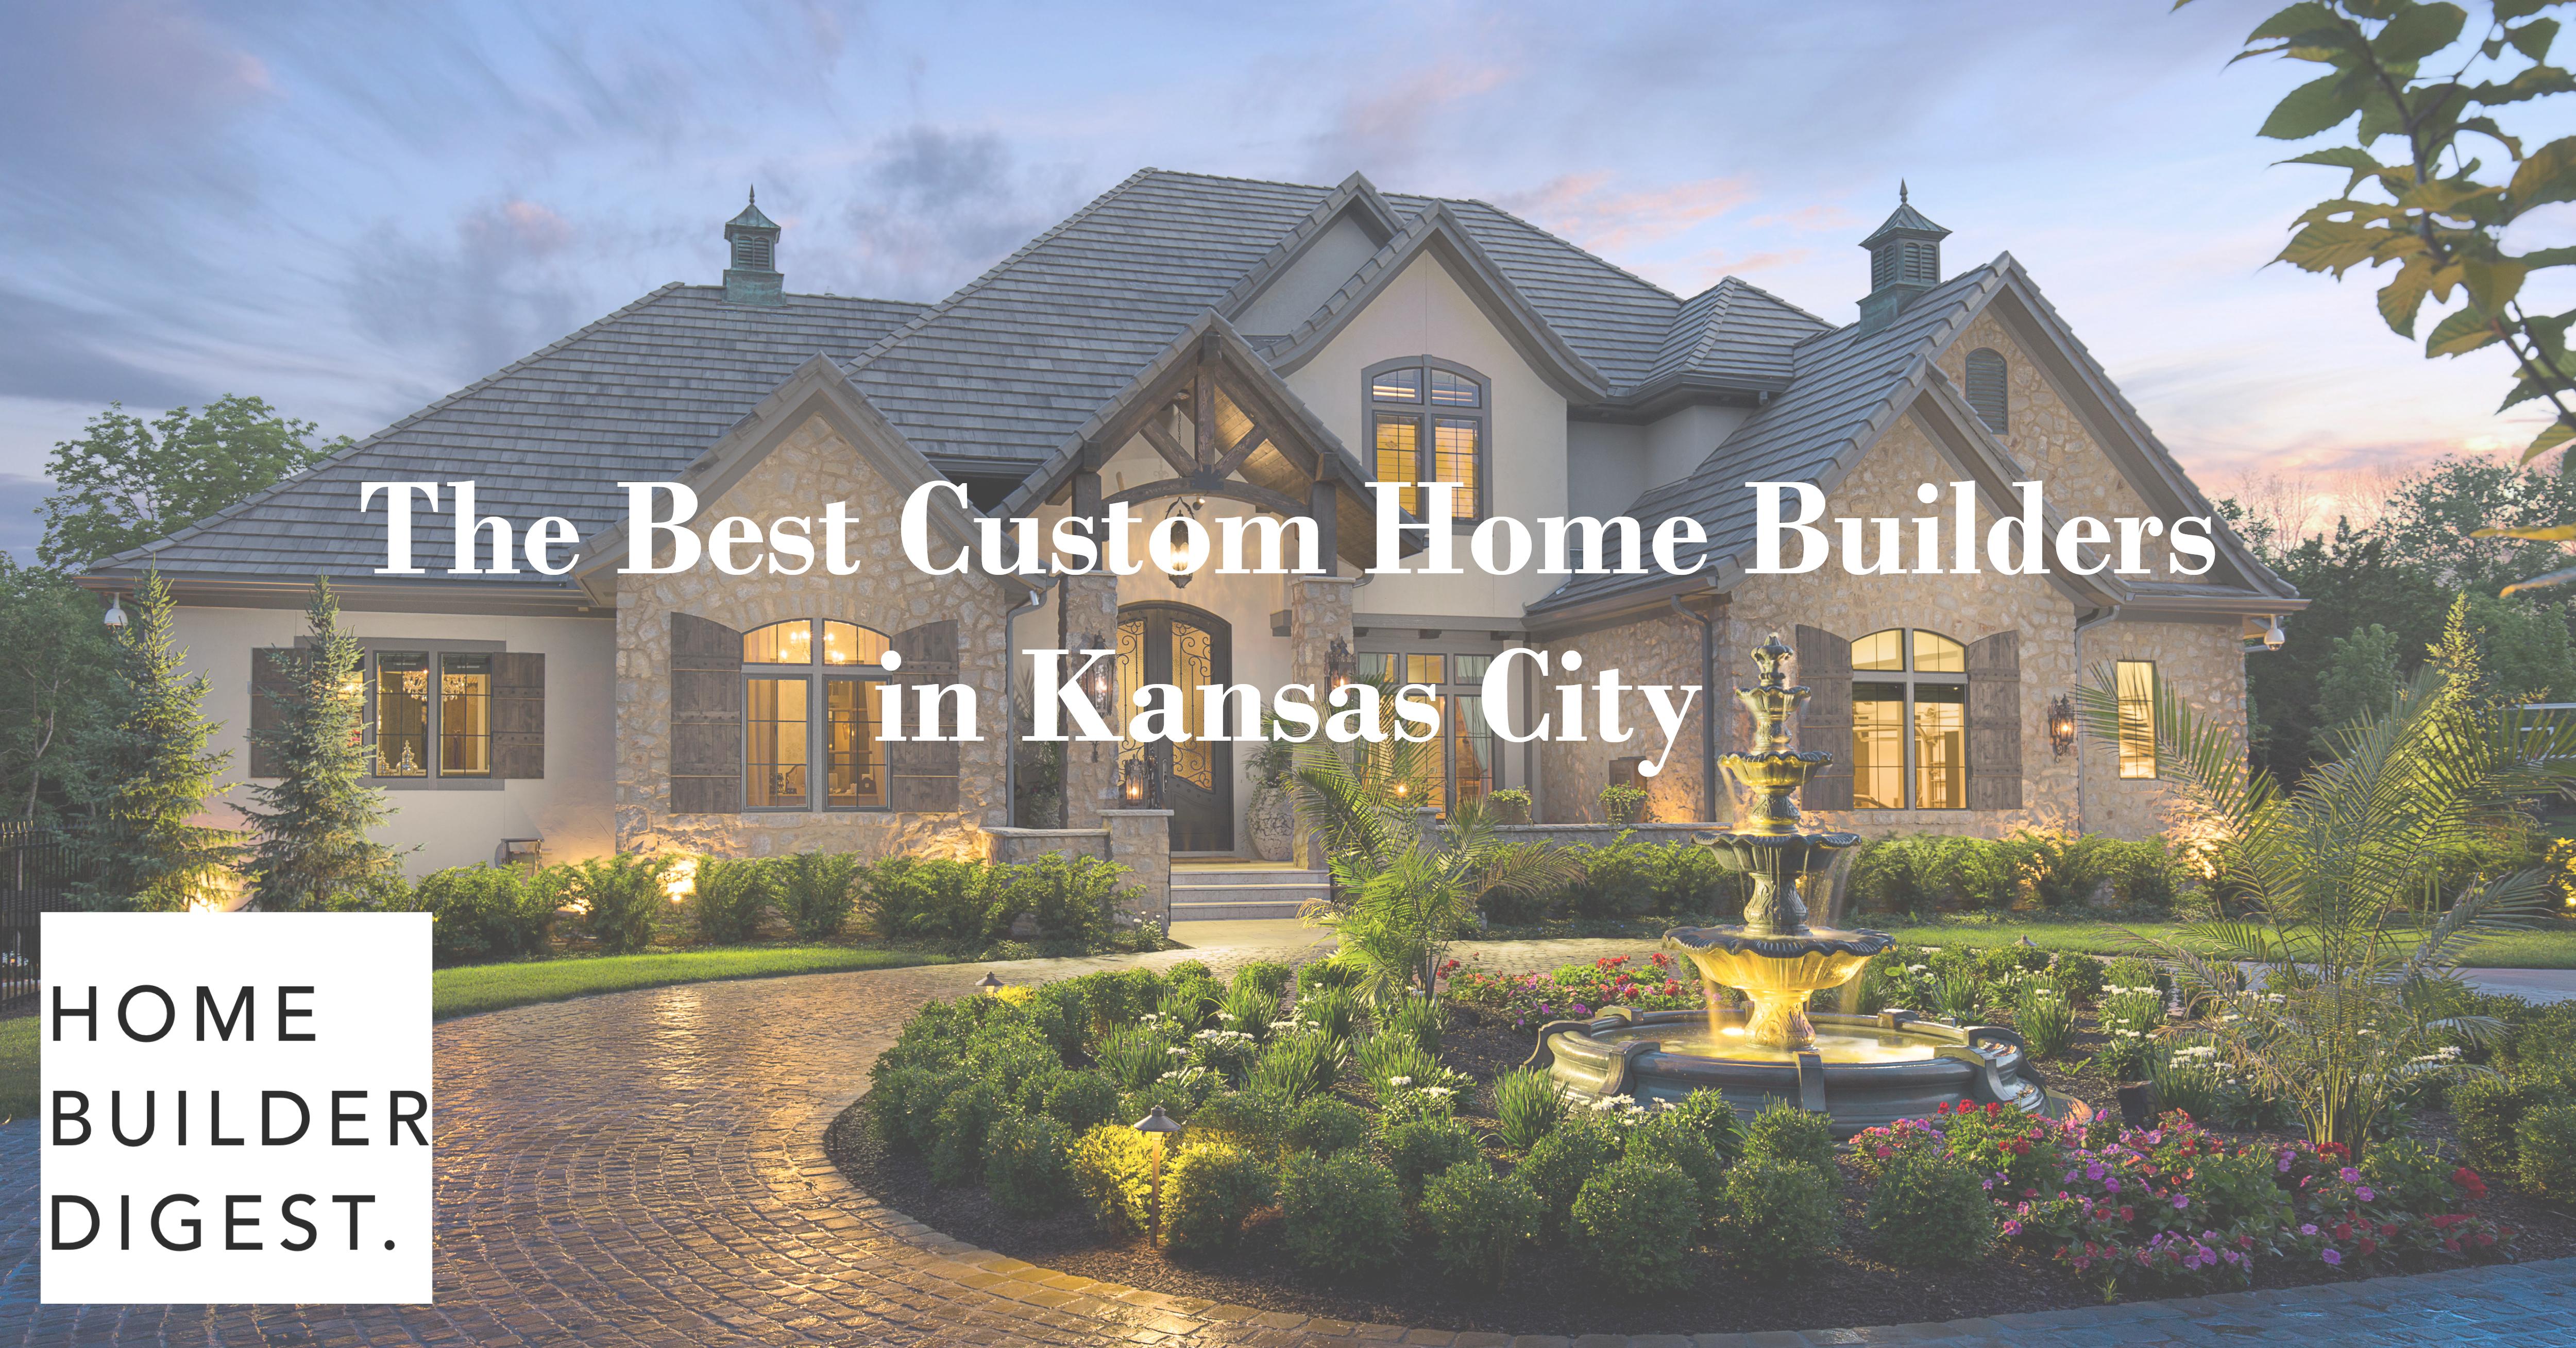 Starr Homes Voted Top 5 Best Custom Home Builder In Kansas City Starr Homes